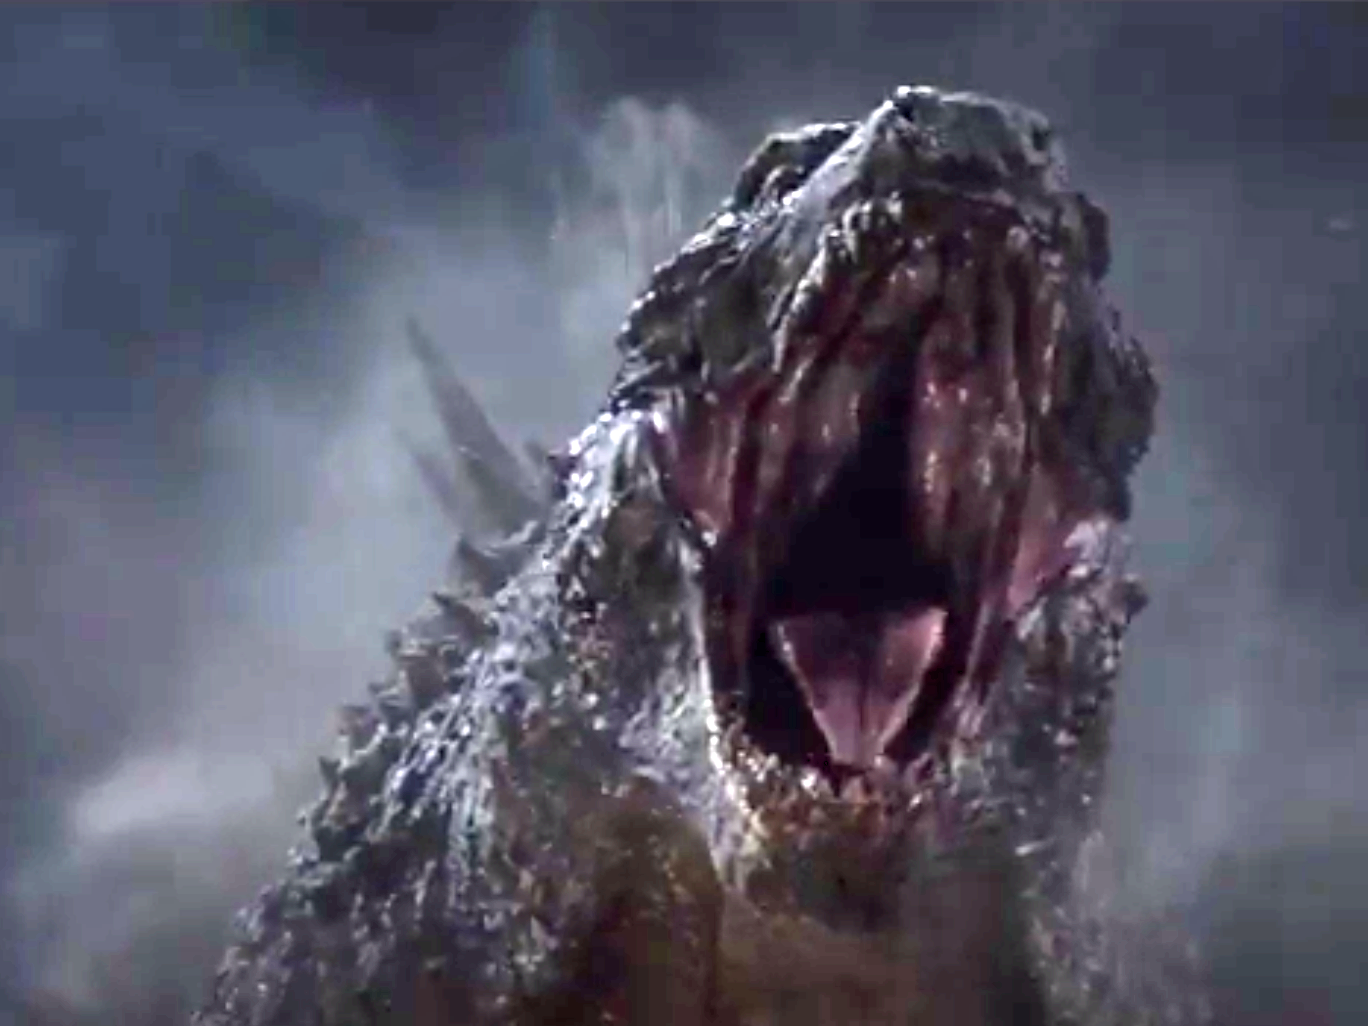 Godzilla 2014   Monster movies Wallpaper 37079691 1368x1026